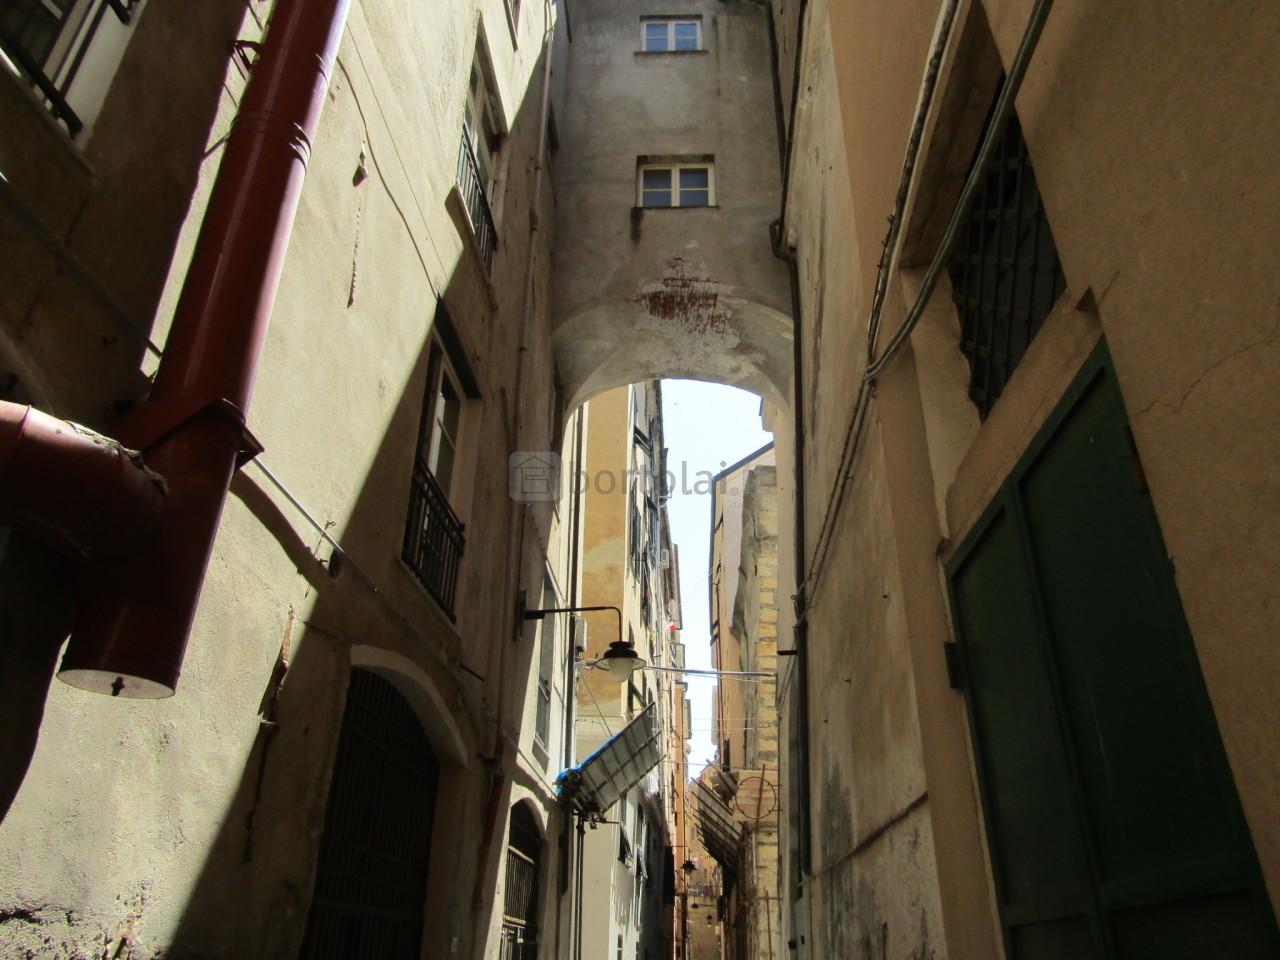 genova vendita quart: centro storico immobiliare-bortolai.it-srl